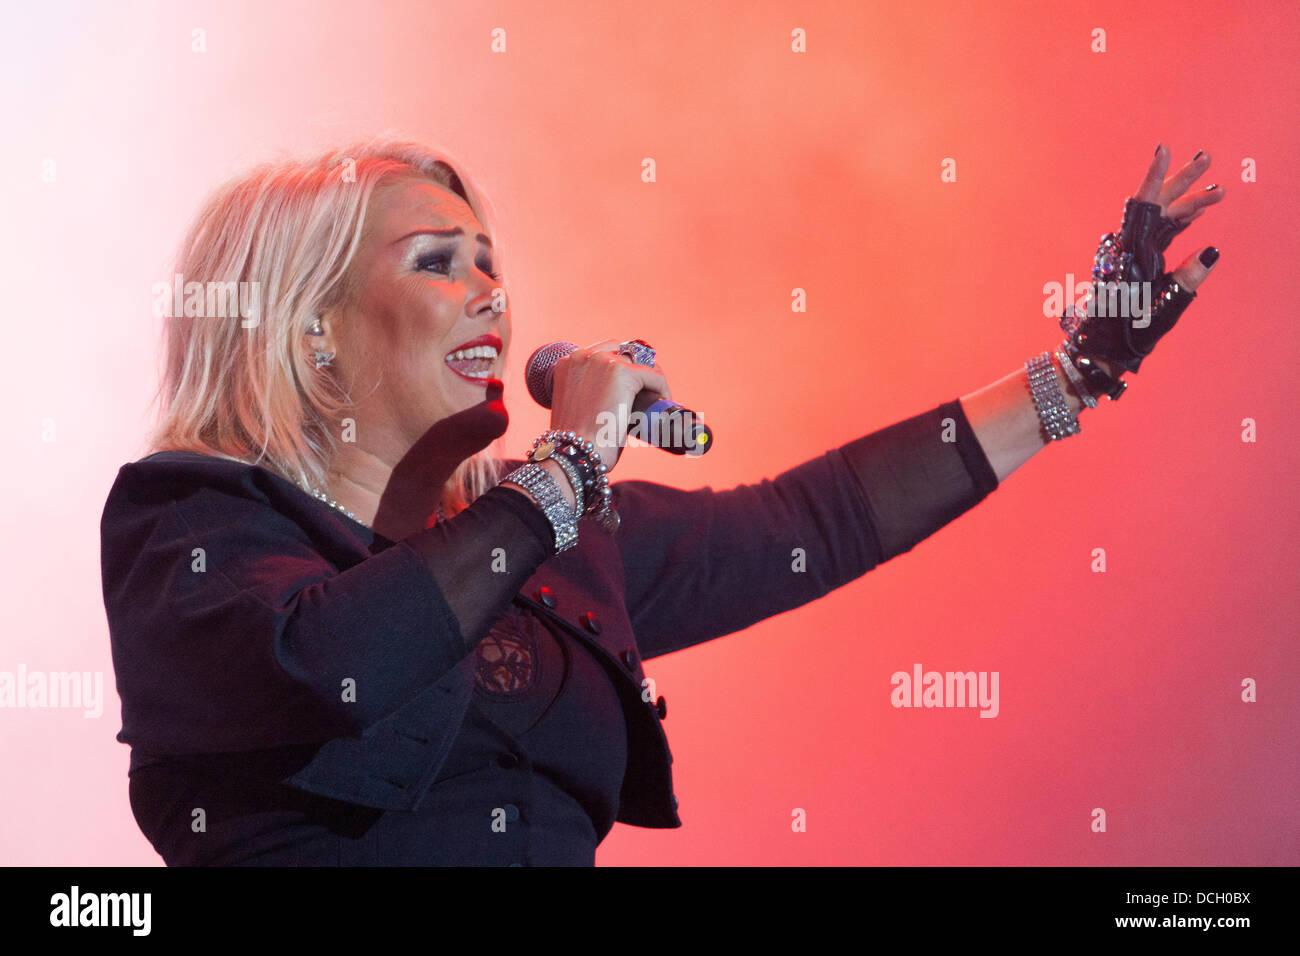 Remenham, Henley-on-Thames, Oxfordshire, Reino Unido. 17 de agosto de 2013. La cantante pop inglesa KIM WILDE realiza Imagen De Stock